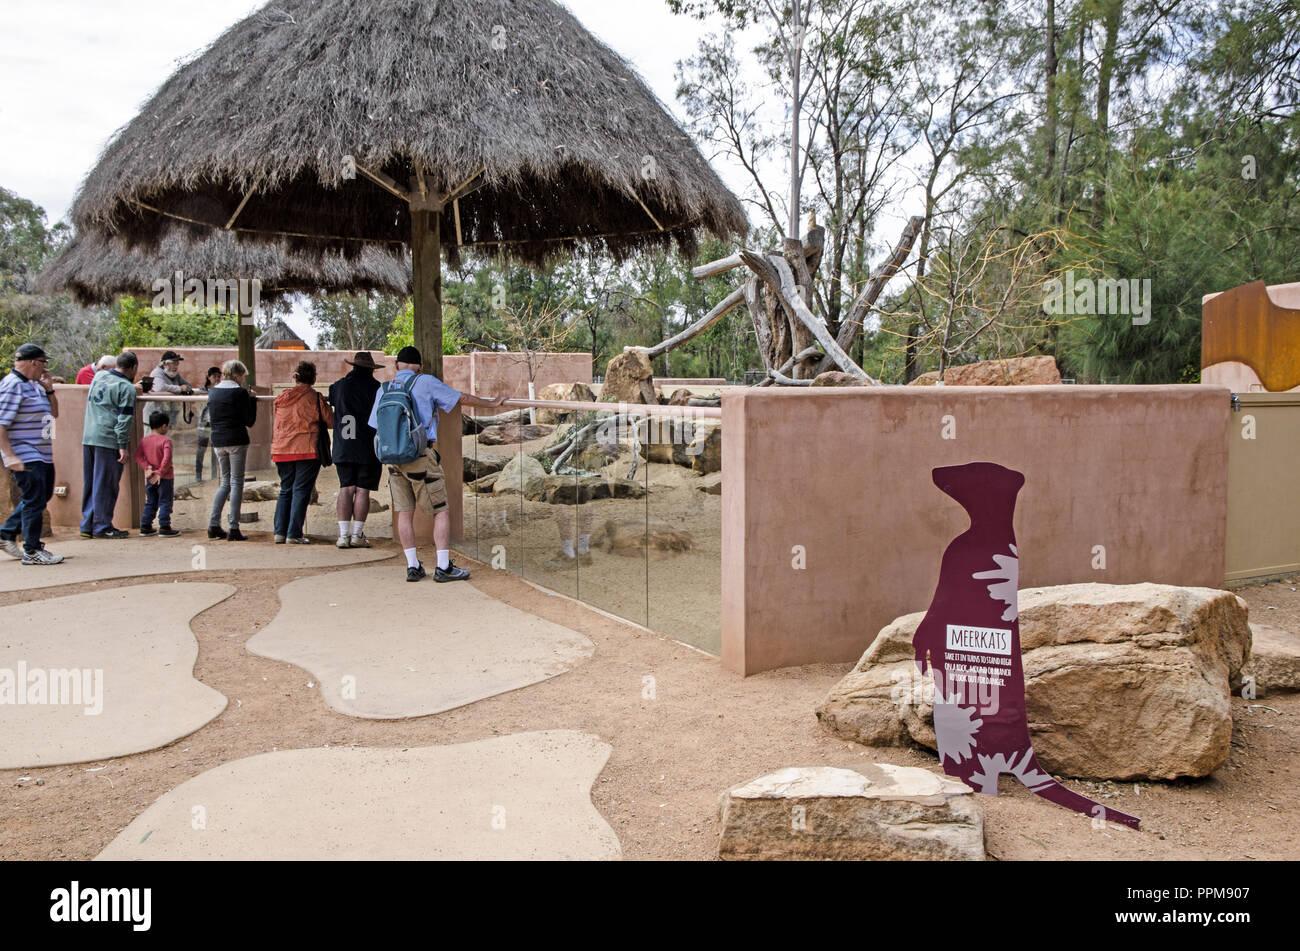 Dubbo Zoo visitors looking at meerkats in their enclosure. Stock Photo